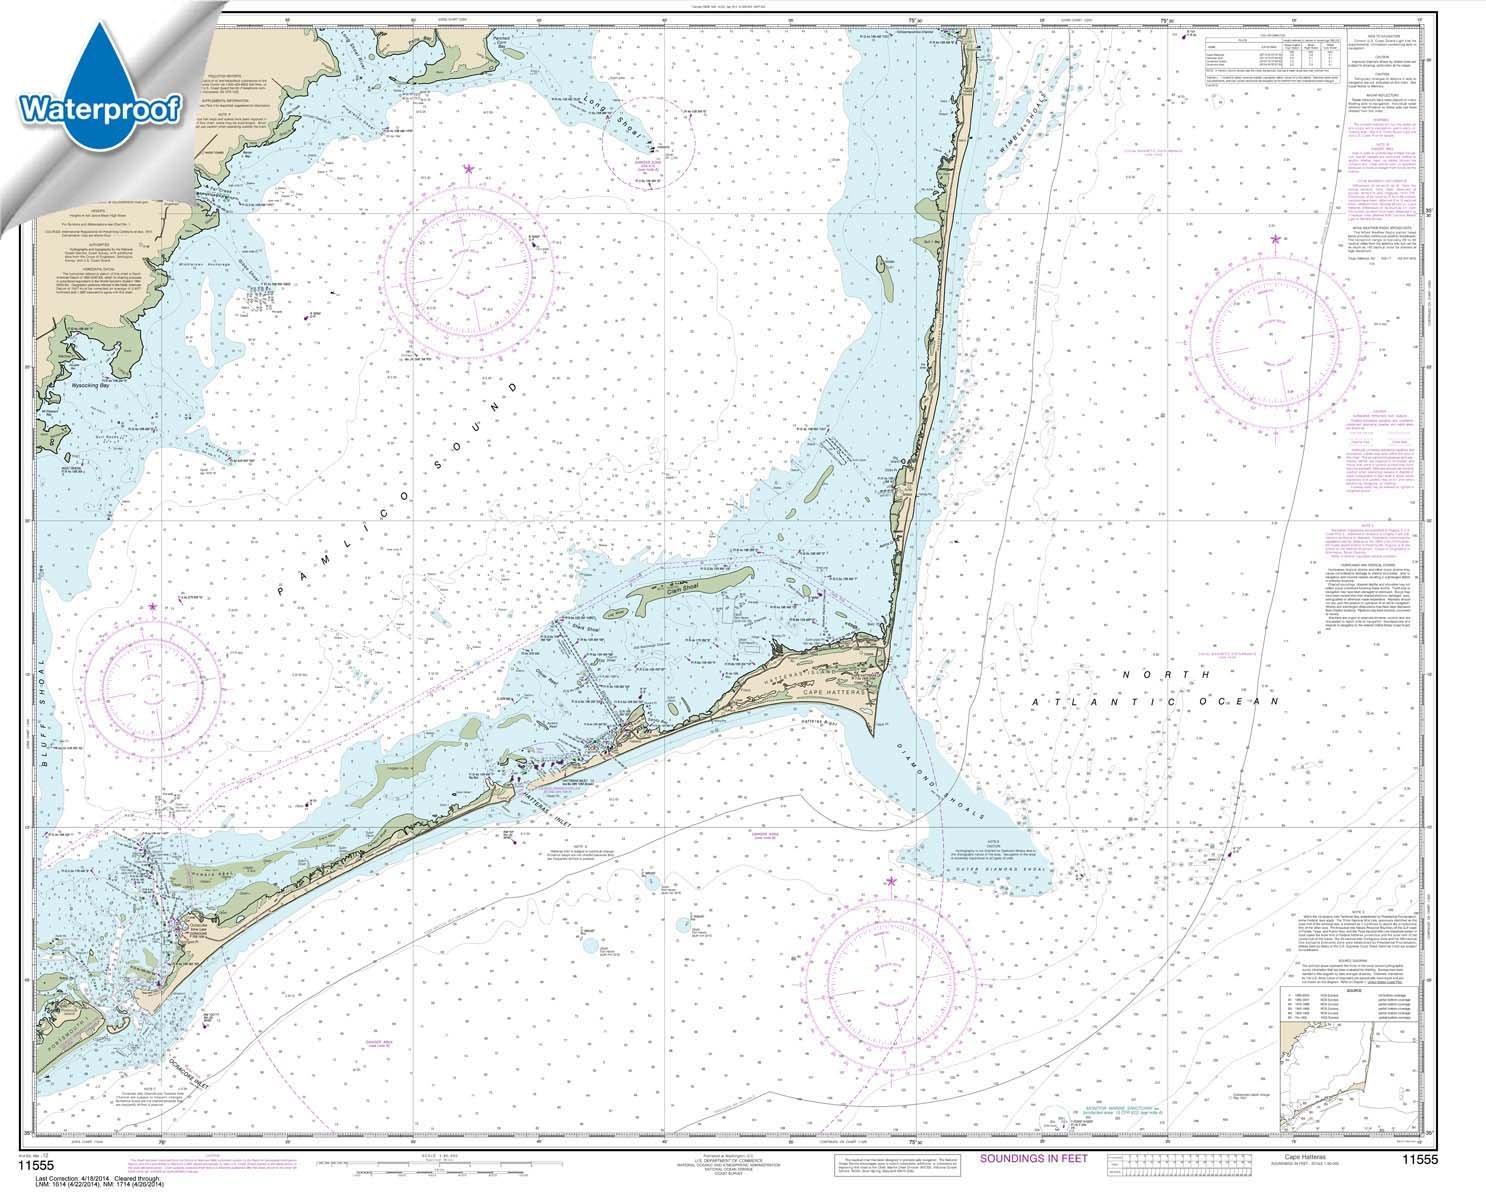 Paradise Cay Publications NOAA Chart 11555: Cape Hatteras-Wimble Shoals to Ocracoke Inlet 35.5 x 44.1 (WATERPROOF)